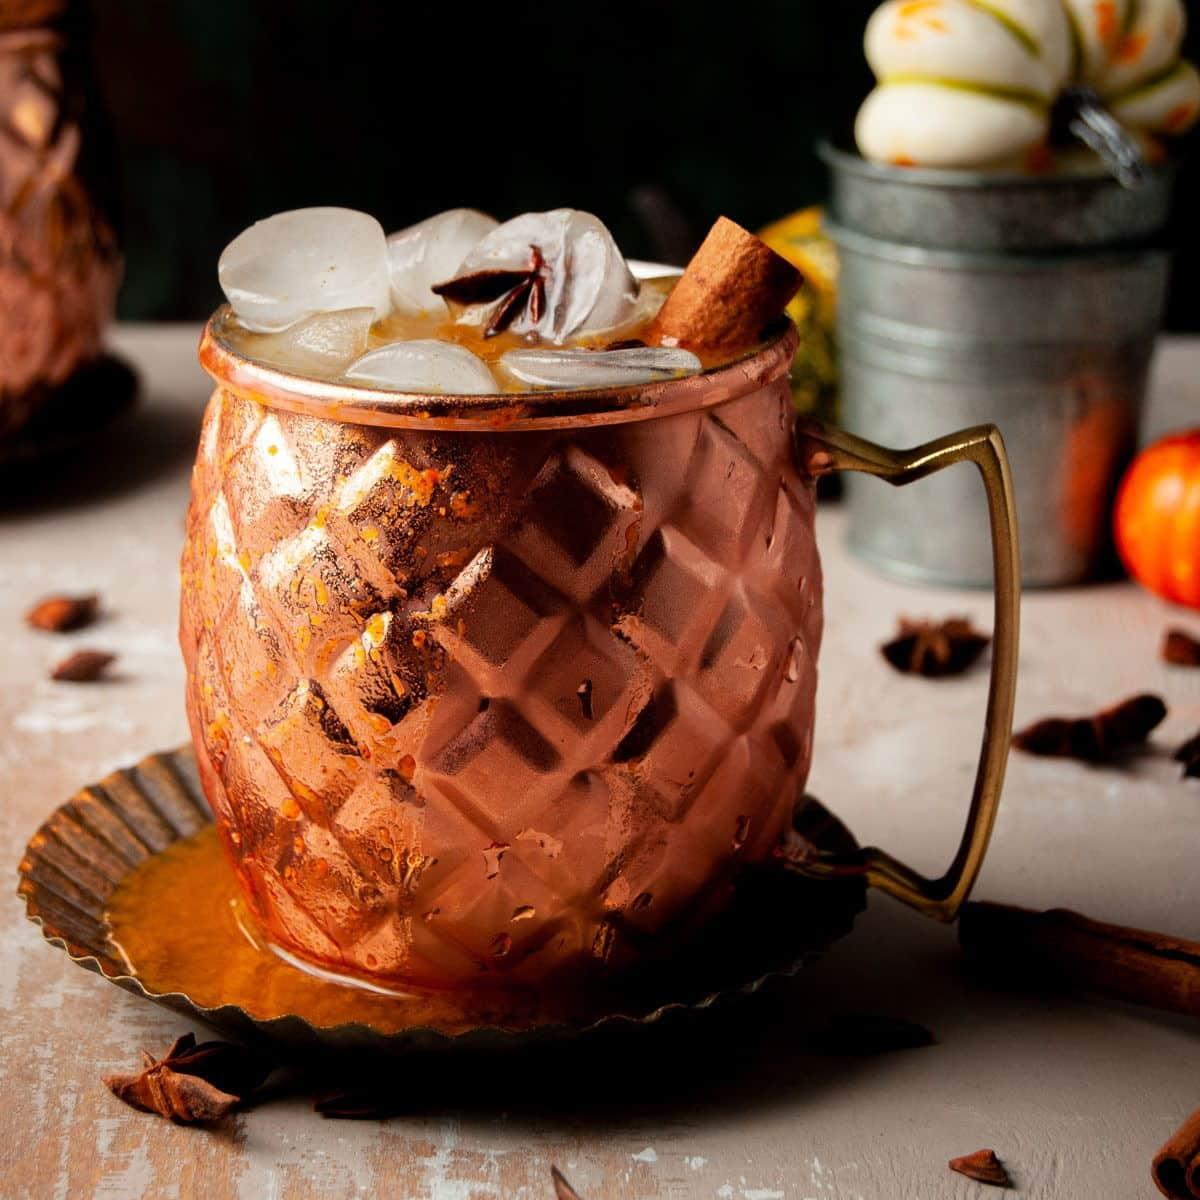 Pumpkin spice mule in copper mug with ice and a cinnamon stick.